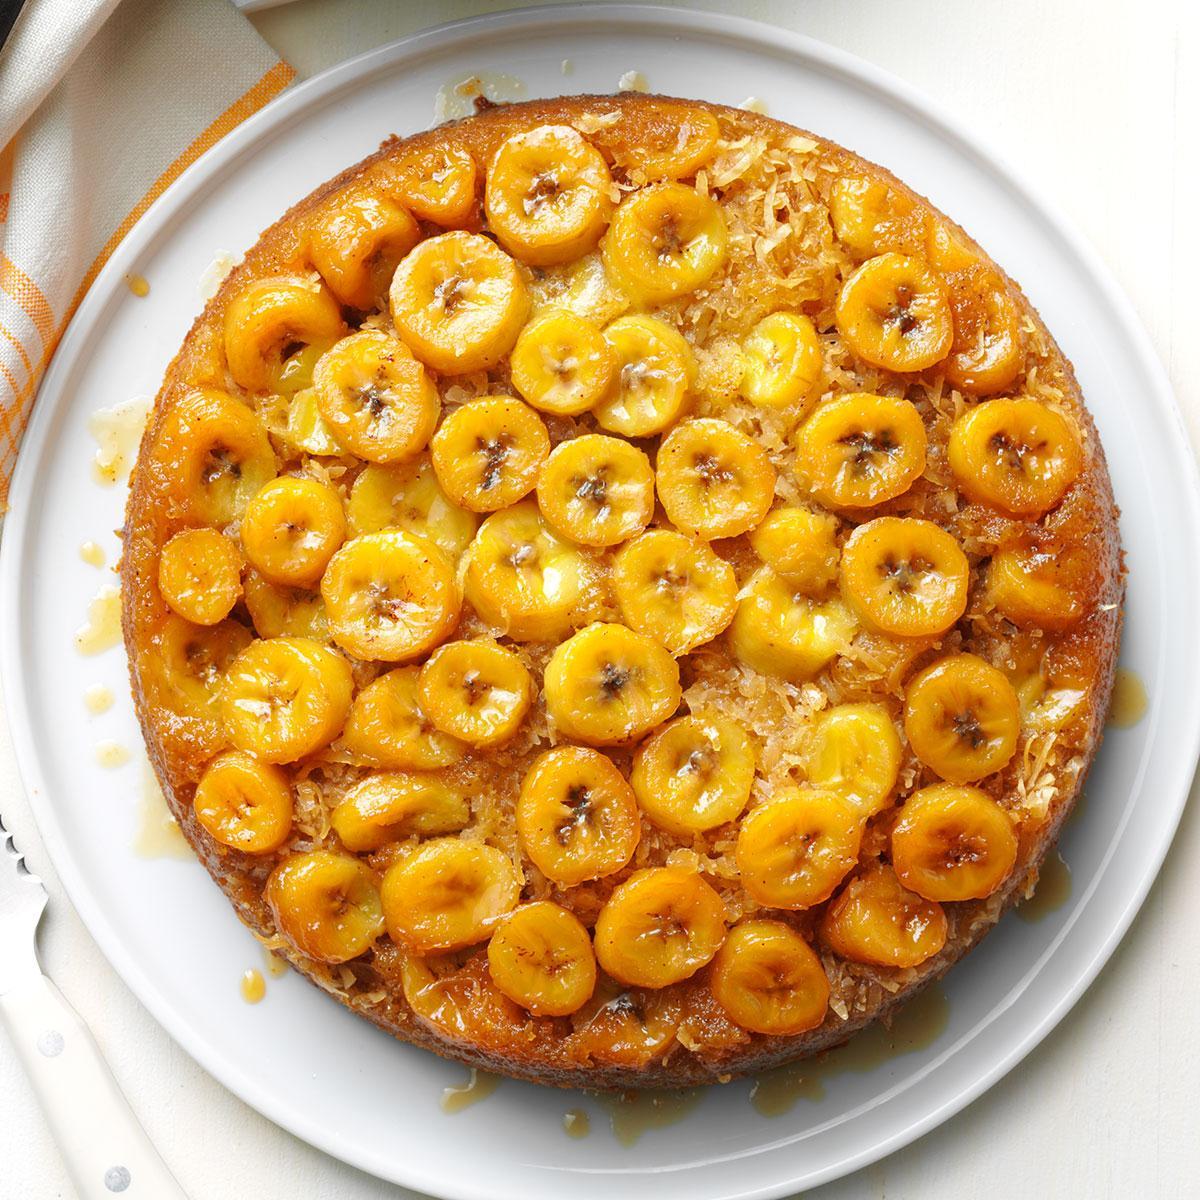 Best Pineapple Upside Down Cake In Cast Iron Skillet